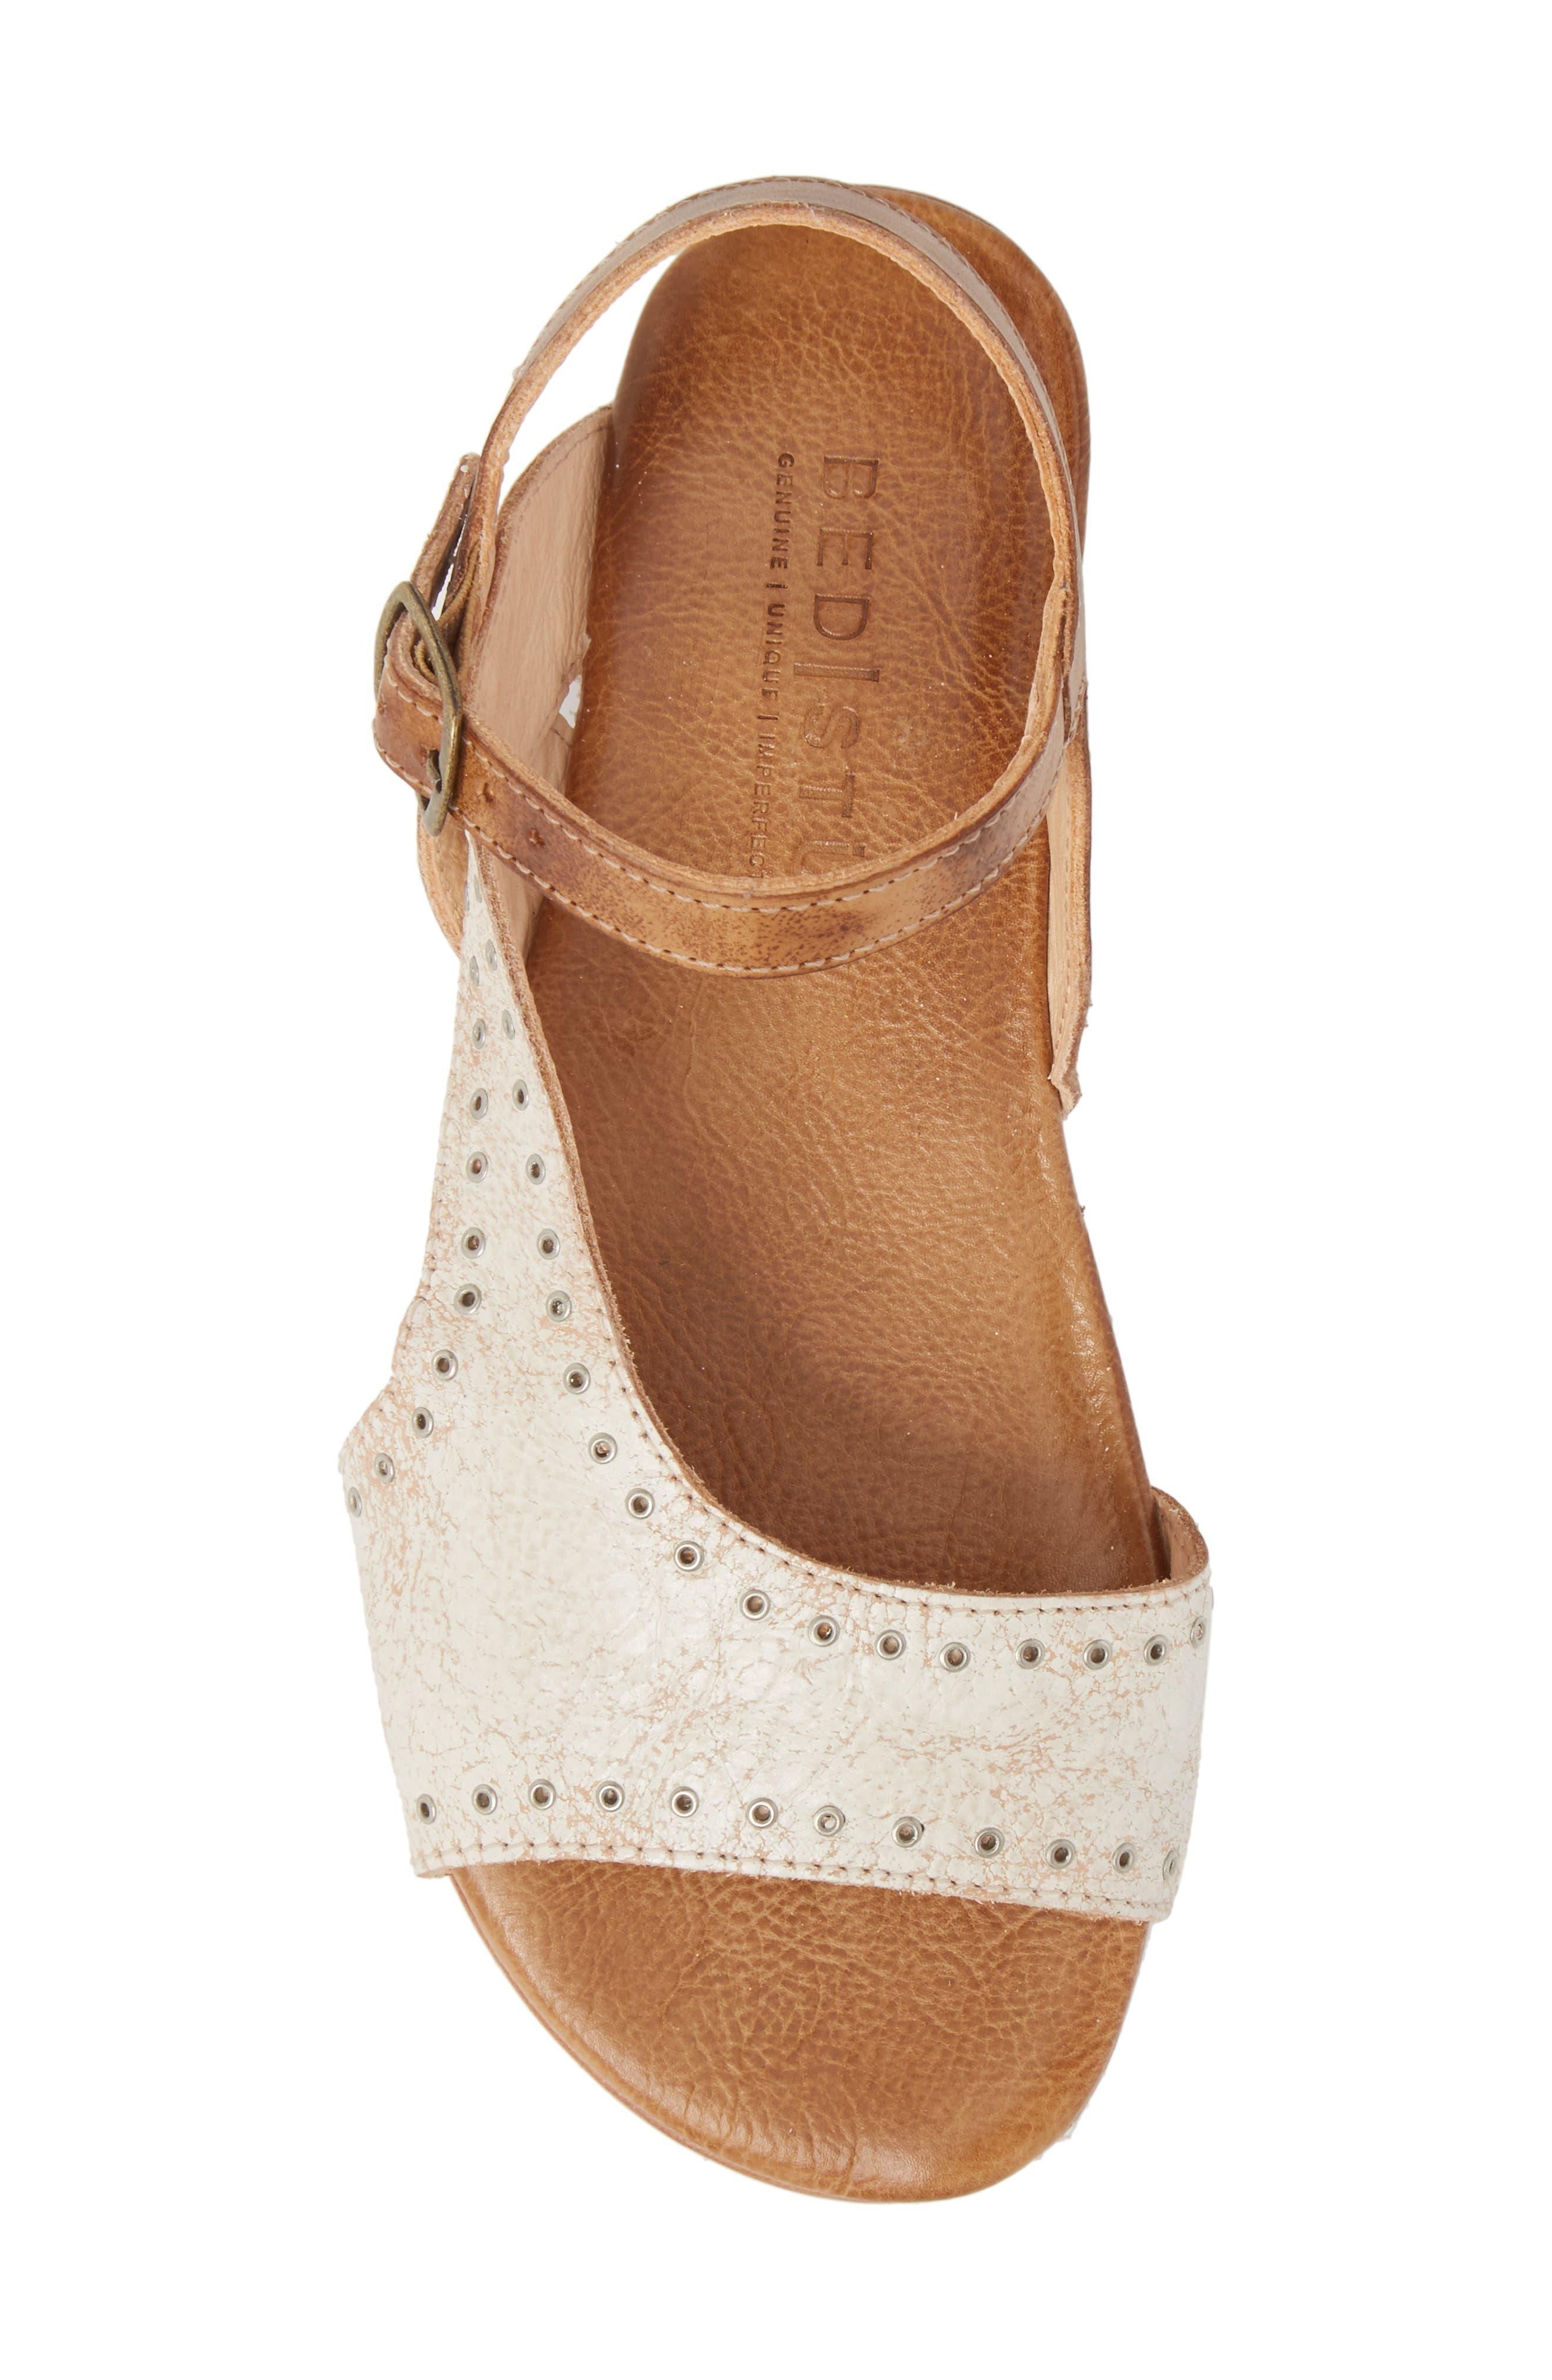 Auburn Flat Sandal,                             Alternate thumbnail 5, color,                             Nectar/ Tan Leather